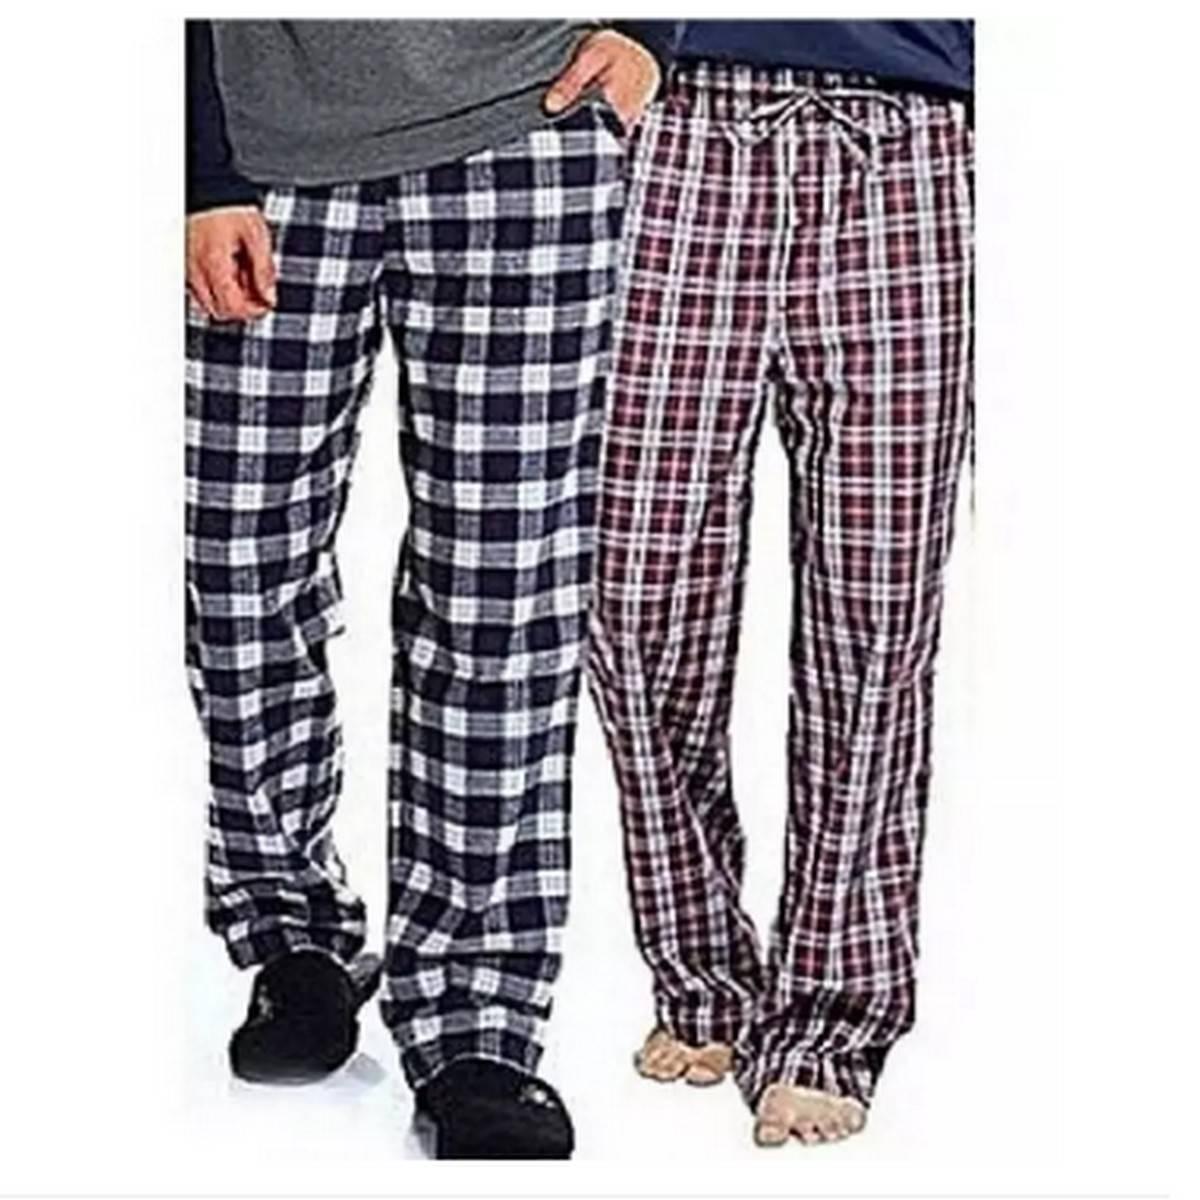 Multicolored Cotton Checkered Trouser for Men 2 pcs